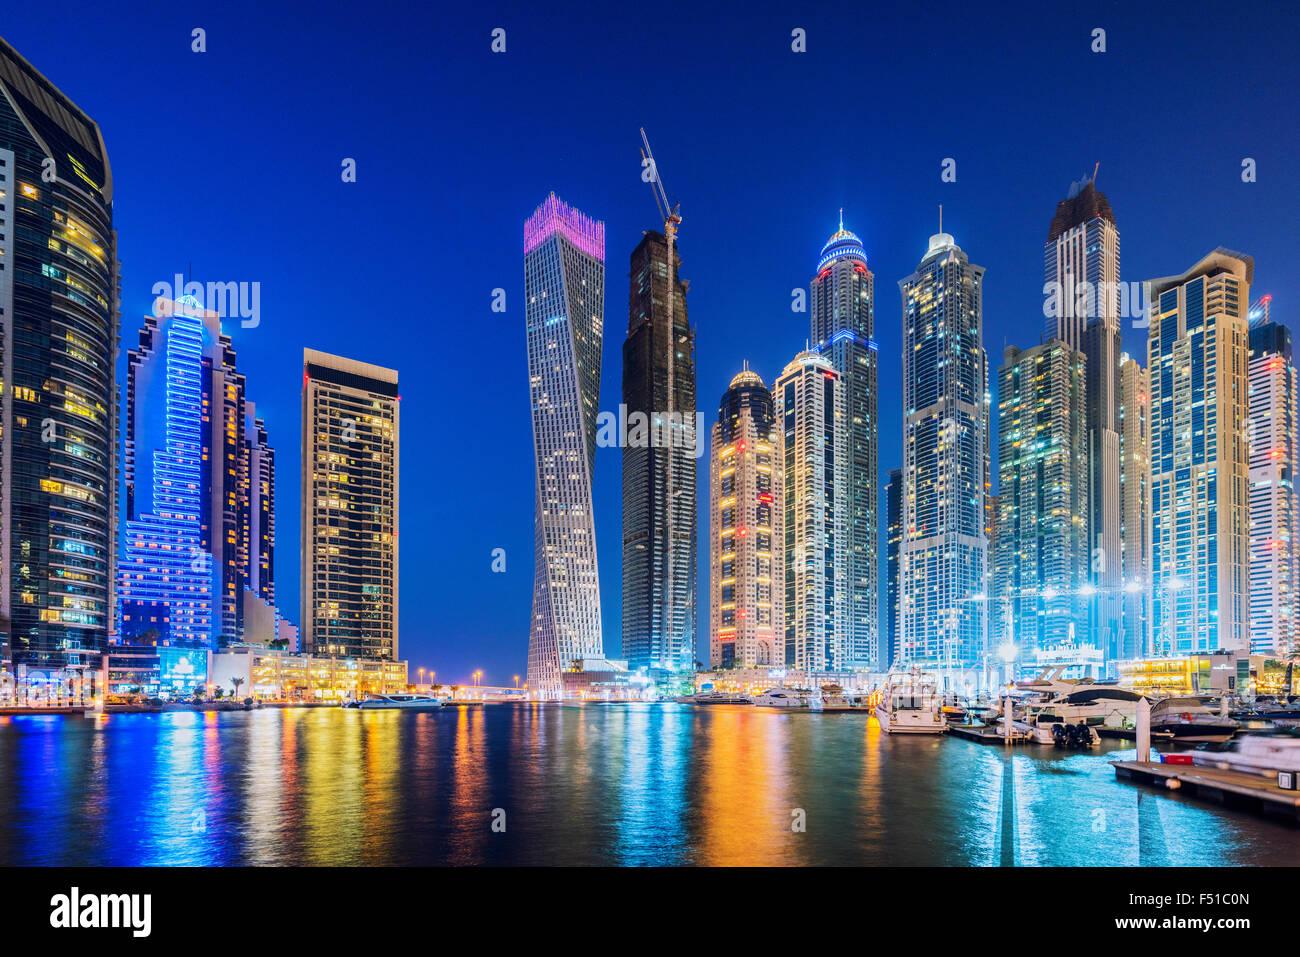 Skyline of skyscrapers  at night in  Marina district of Dubai United Arab Emirates - Stock Image